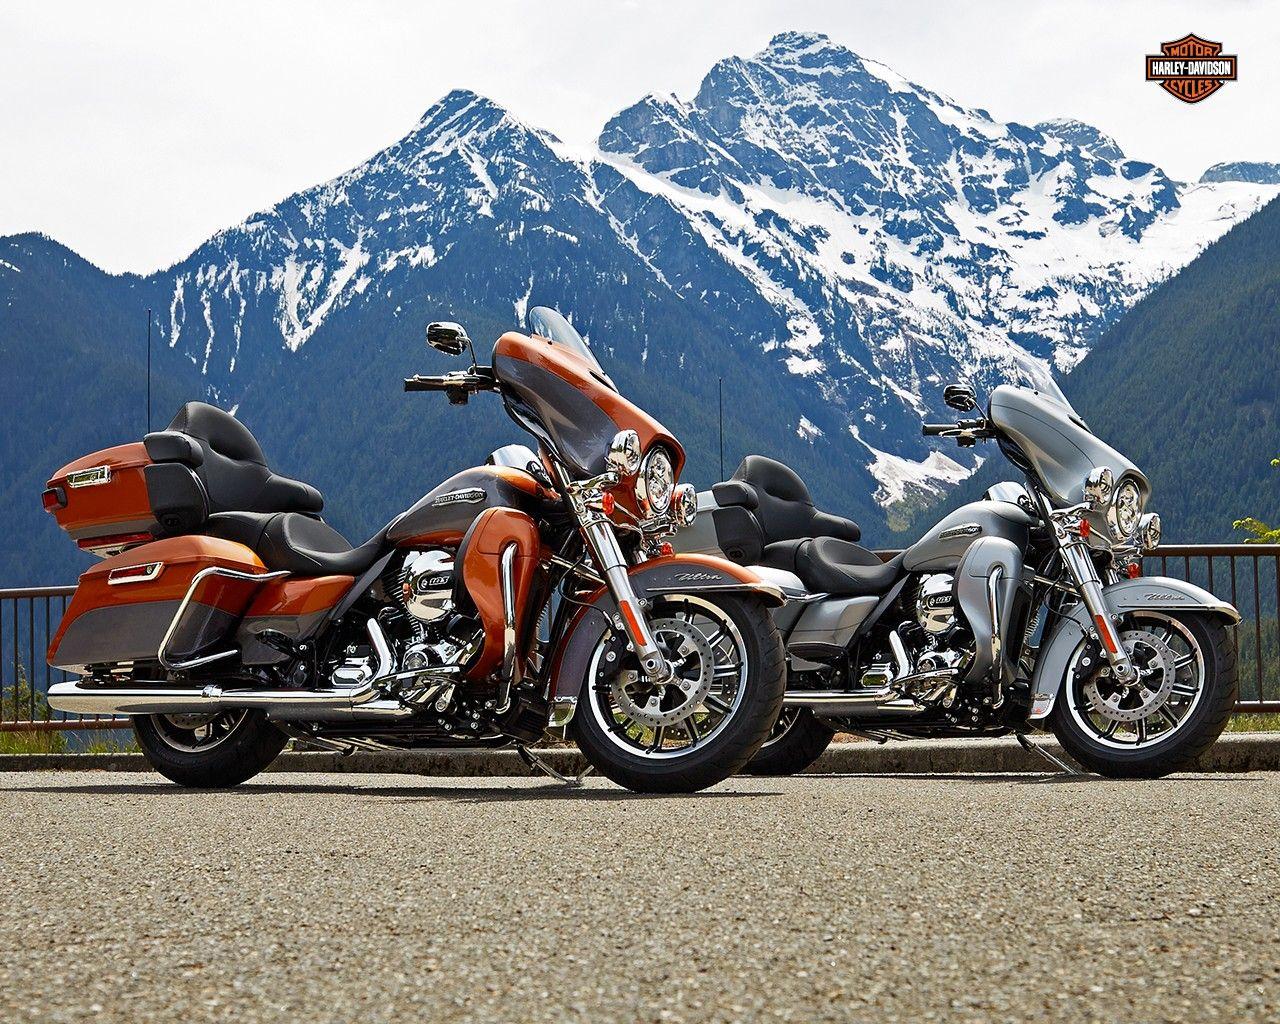 2015 Touring Electra Glide Ultra Classic Harley Davidson Usa [ 1024 x 1280 Pixel ]